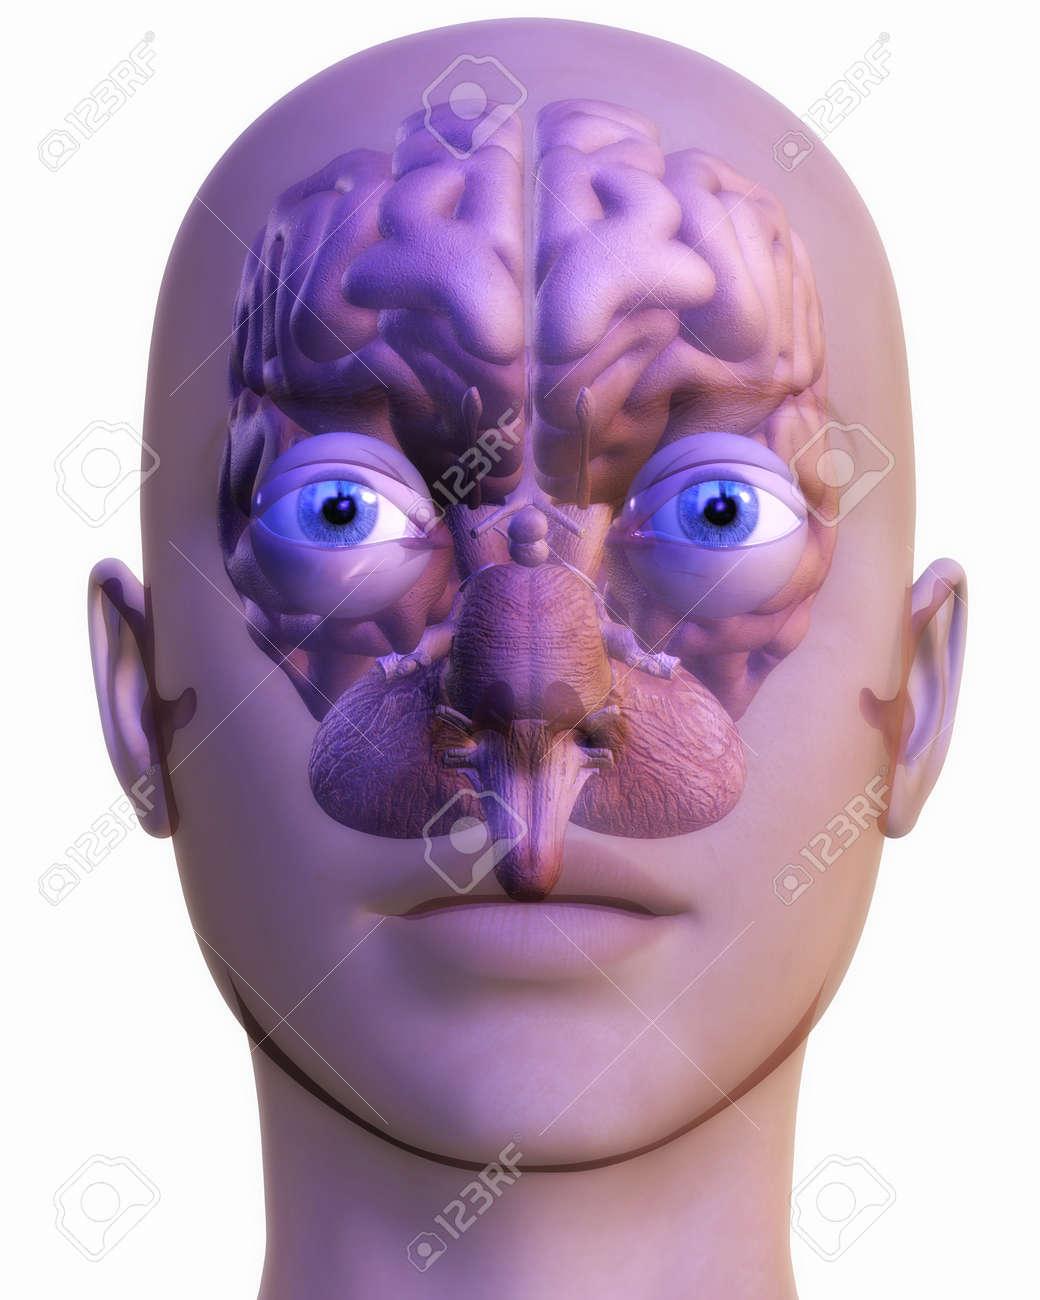 Digital Illustration of a human Brain Stock Photo - 24135394